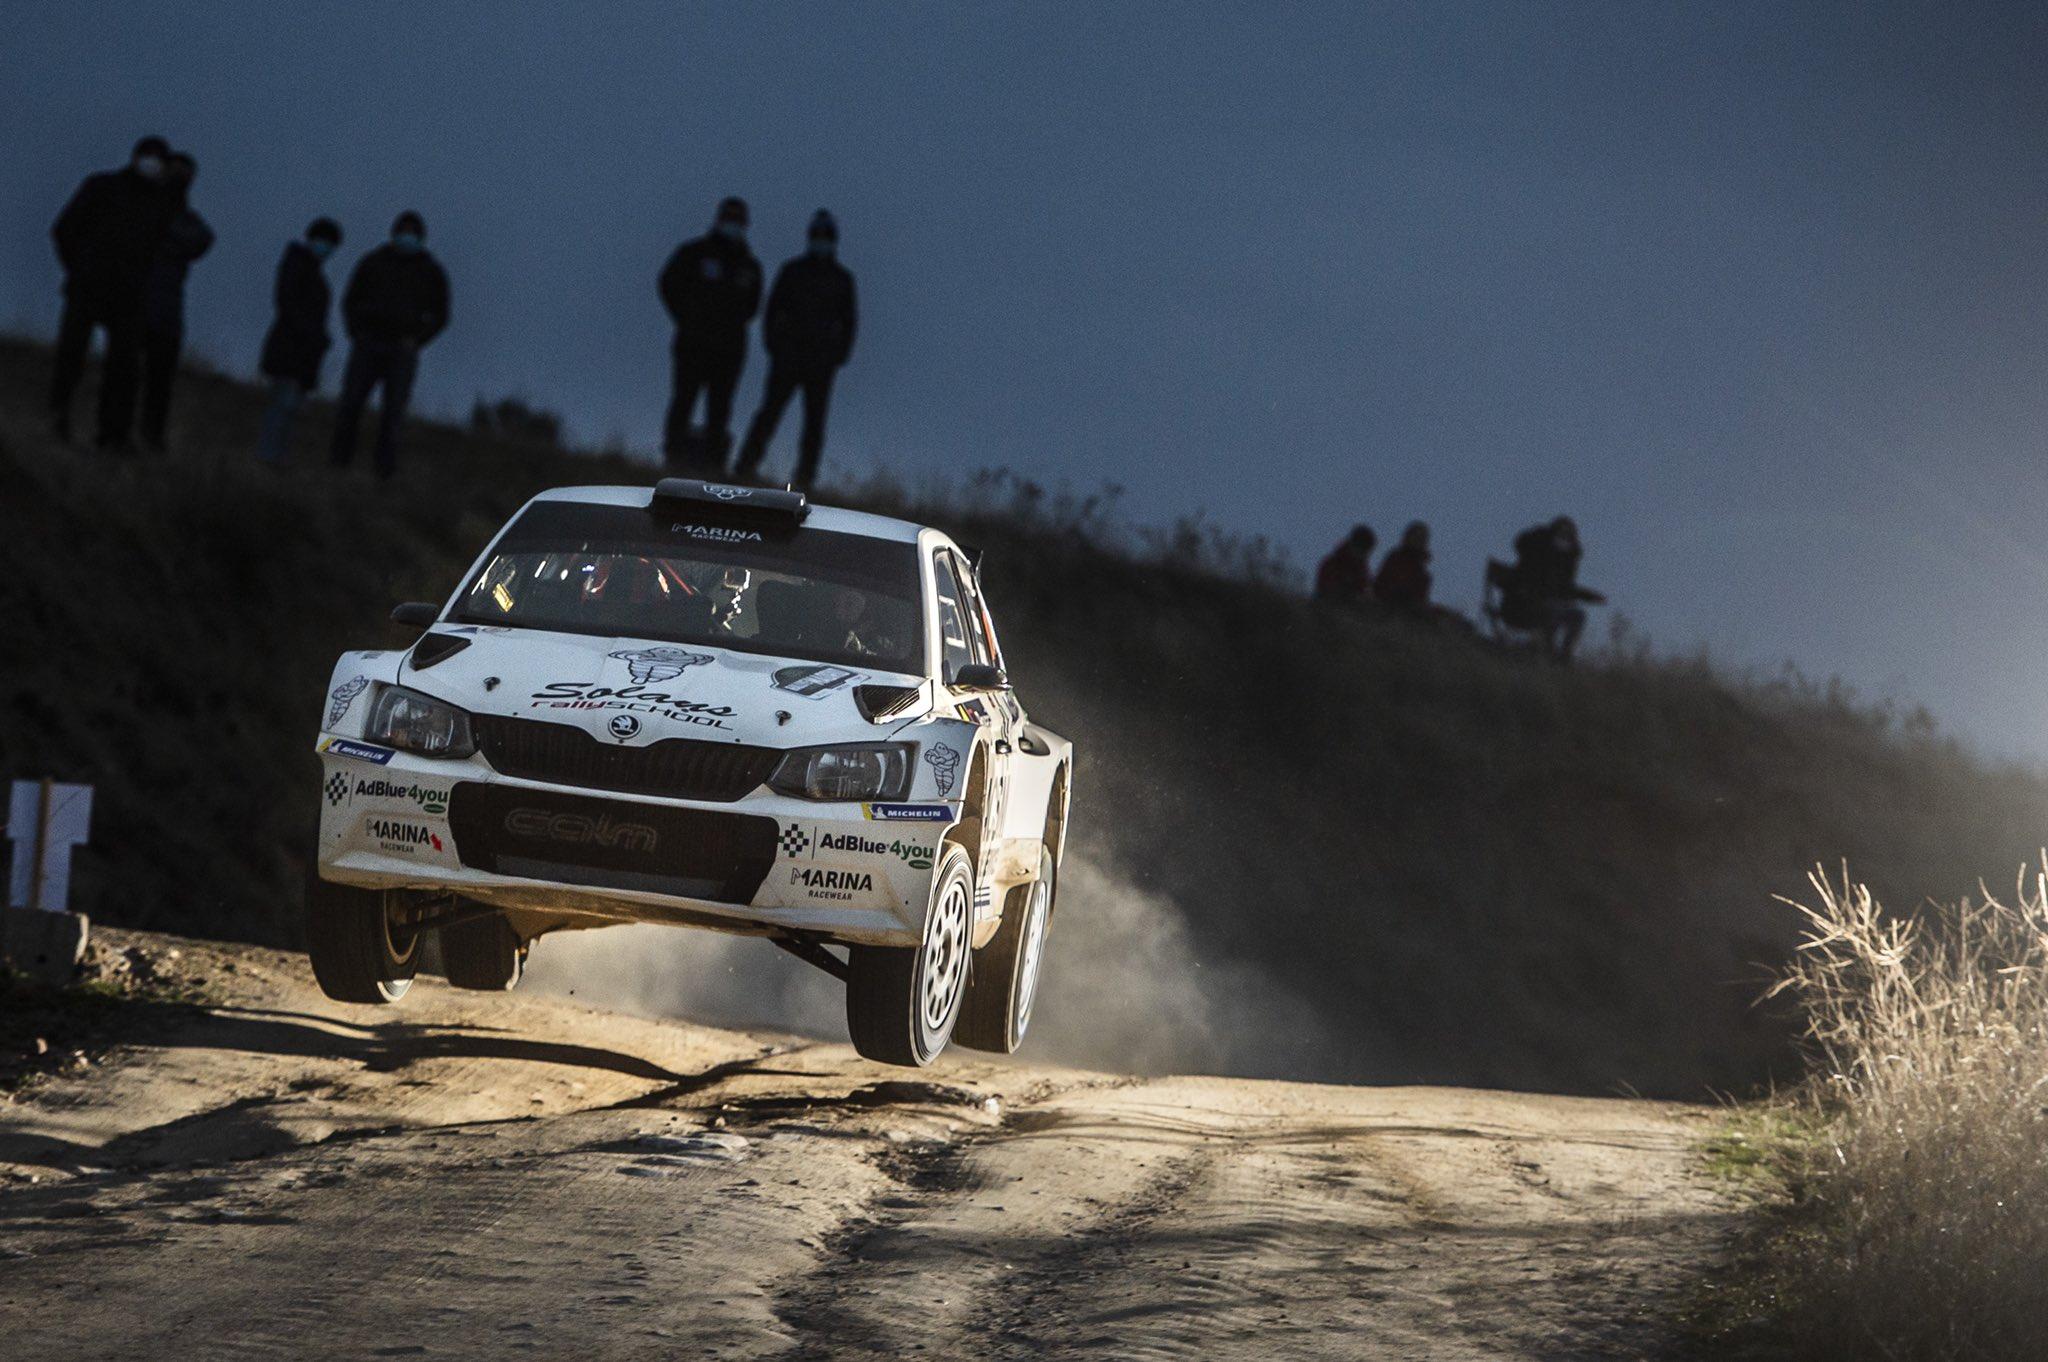 SCER + CERT: Rallye de Tierra de Madrid [13-14 Noviembre] - Página 4 Emy8c1BXEAQGl5C?format=jpg&name=large